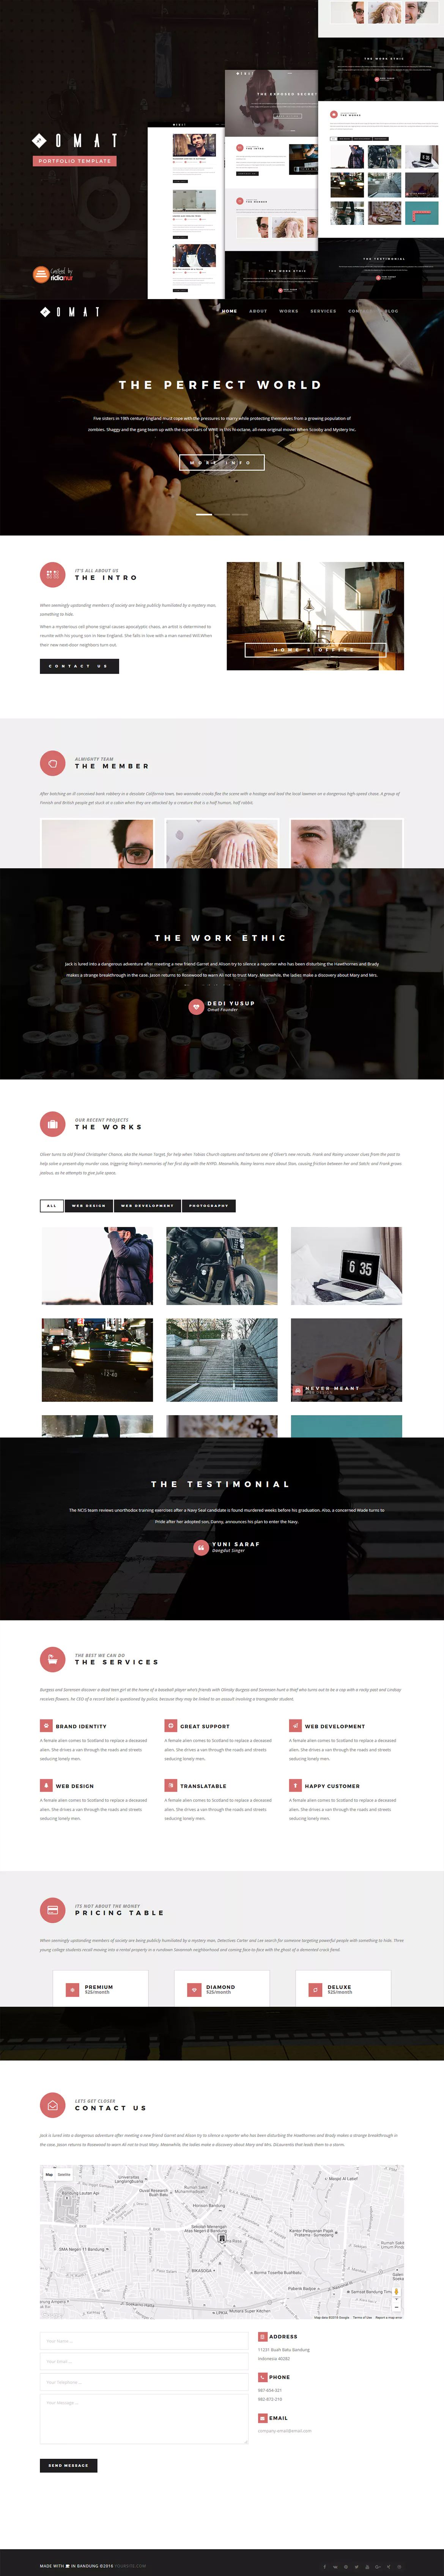 Alien Invasion Free Website Template Free 11